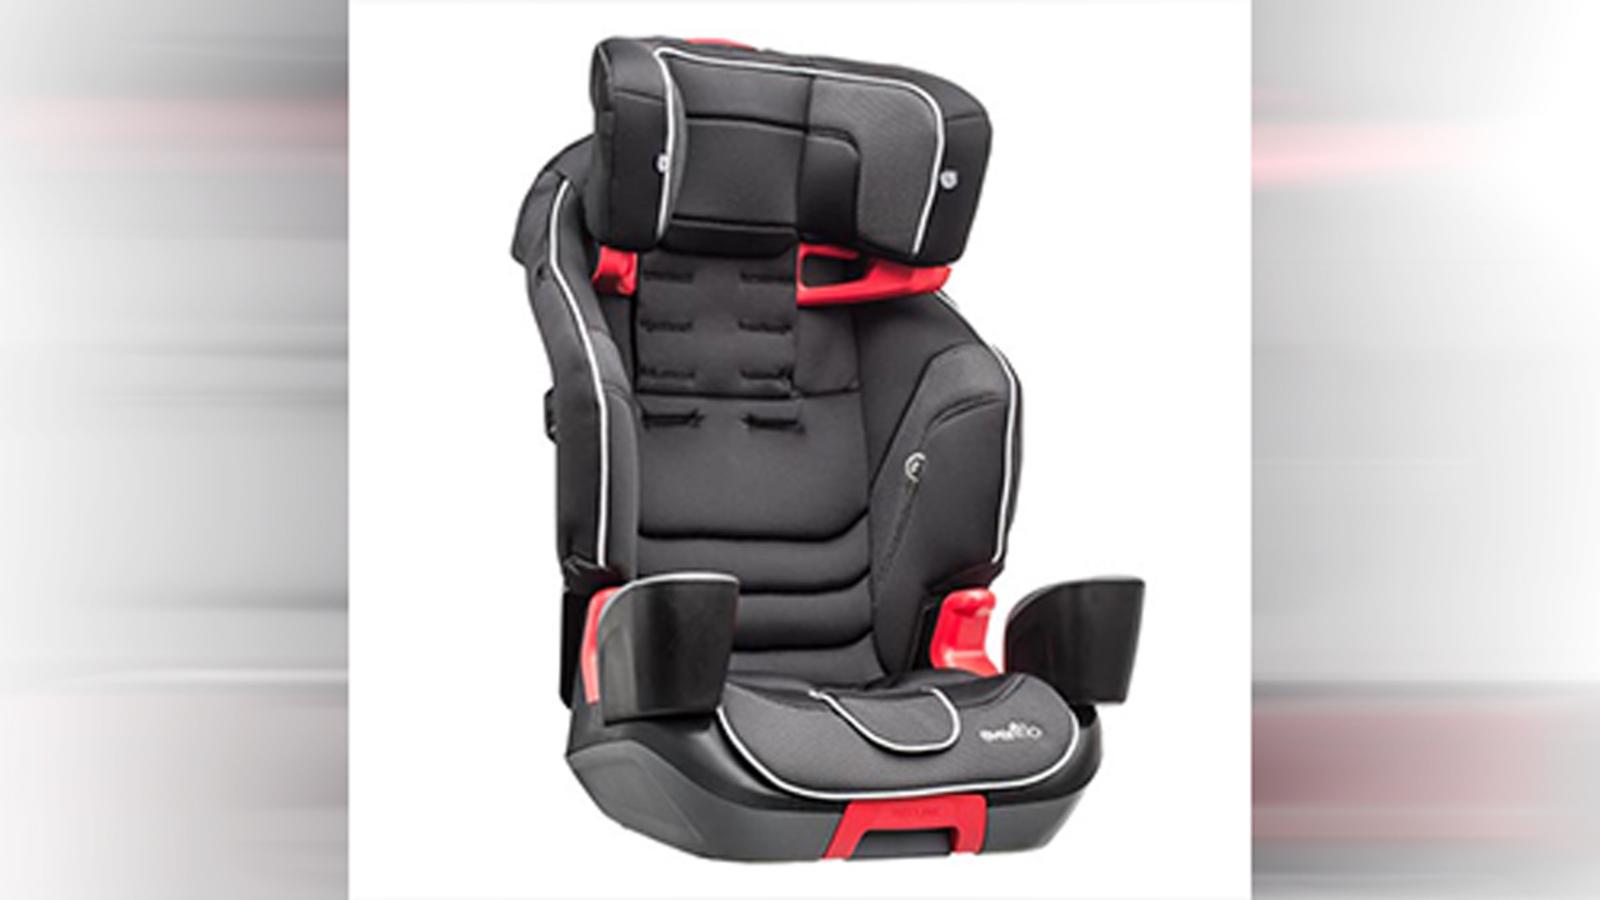 Evenflo recalls booster seats; children can loosen harness ...